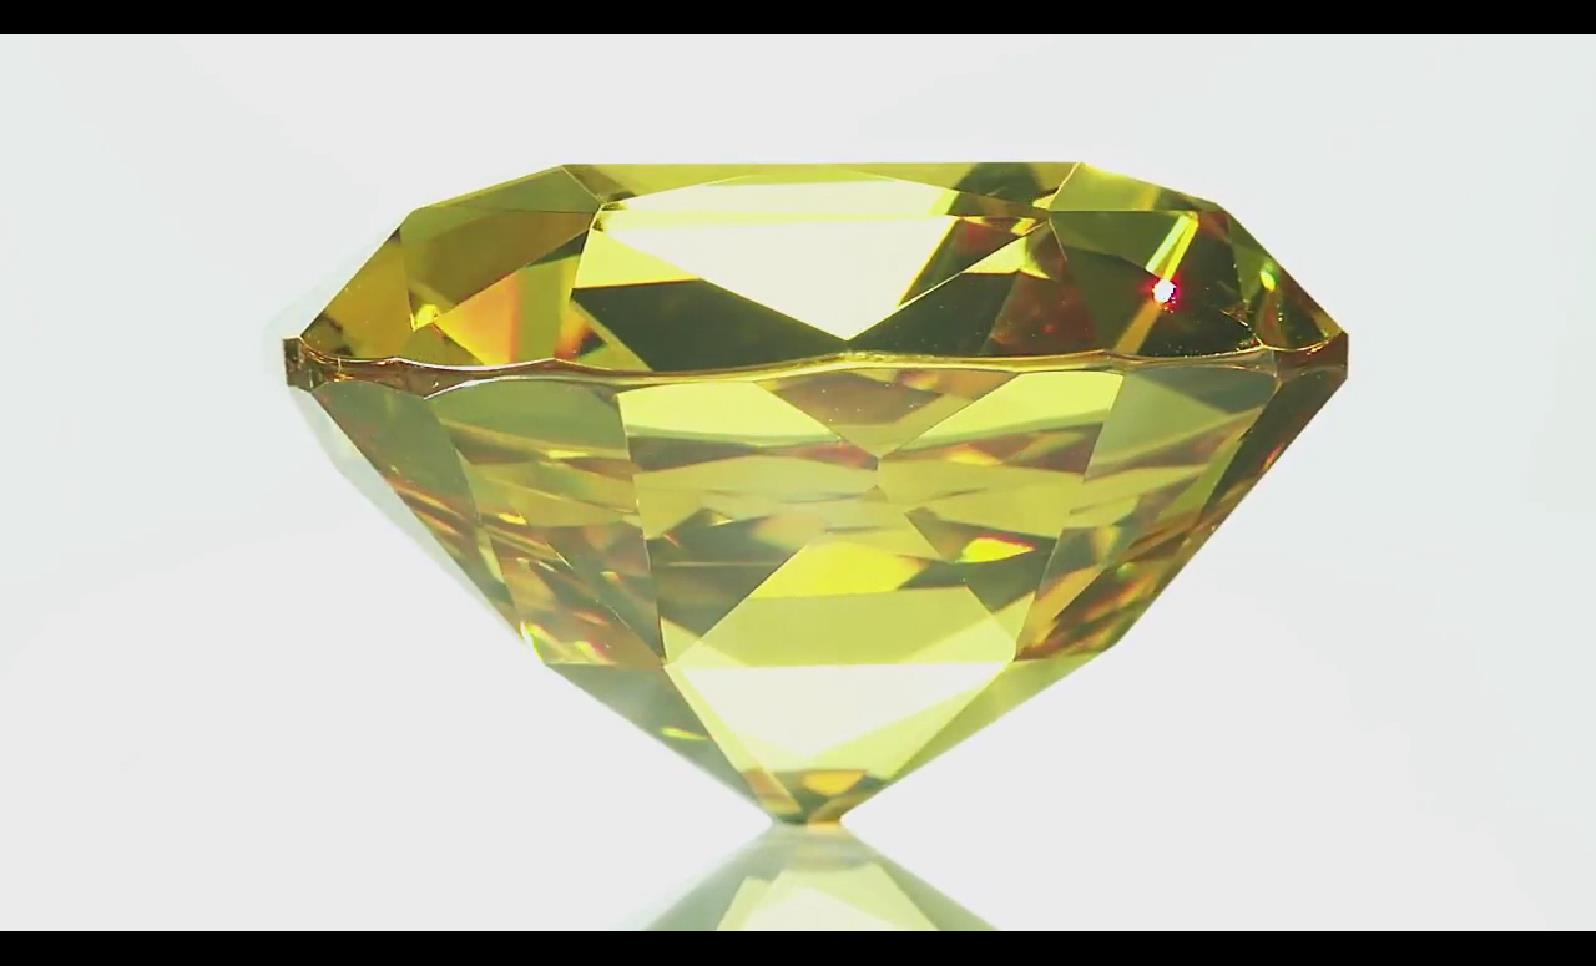 BS 036 BS 34 钻戒展示 珠宝工艺 珠宝设计 珠宝展示_2